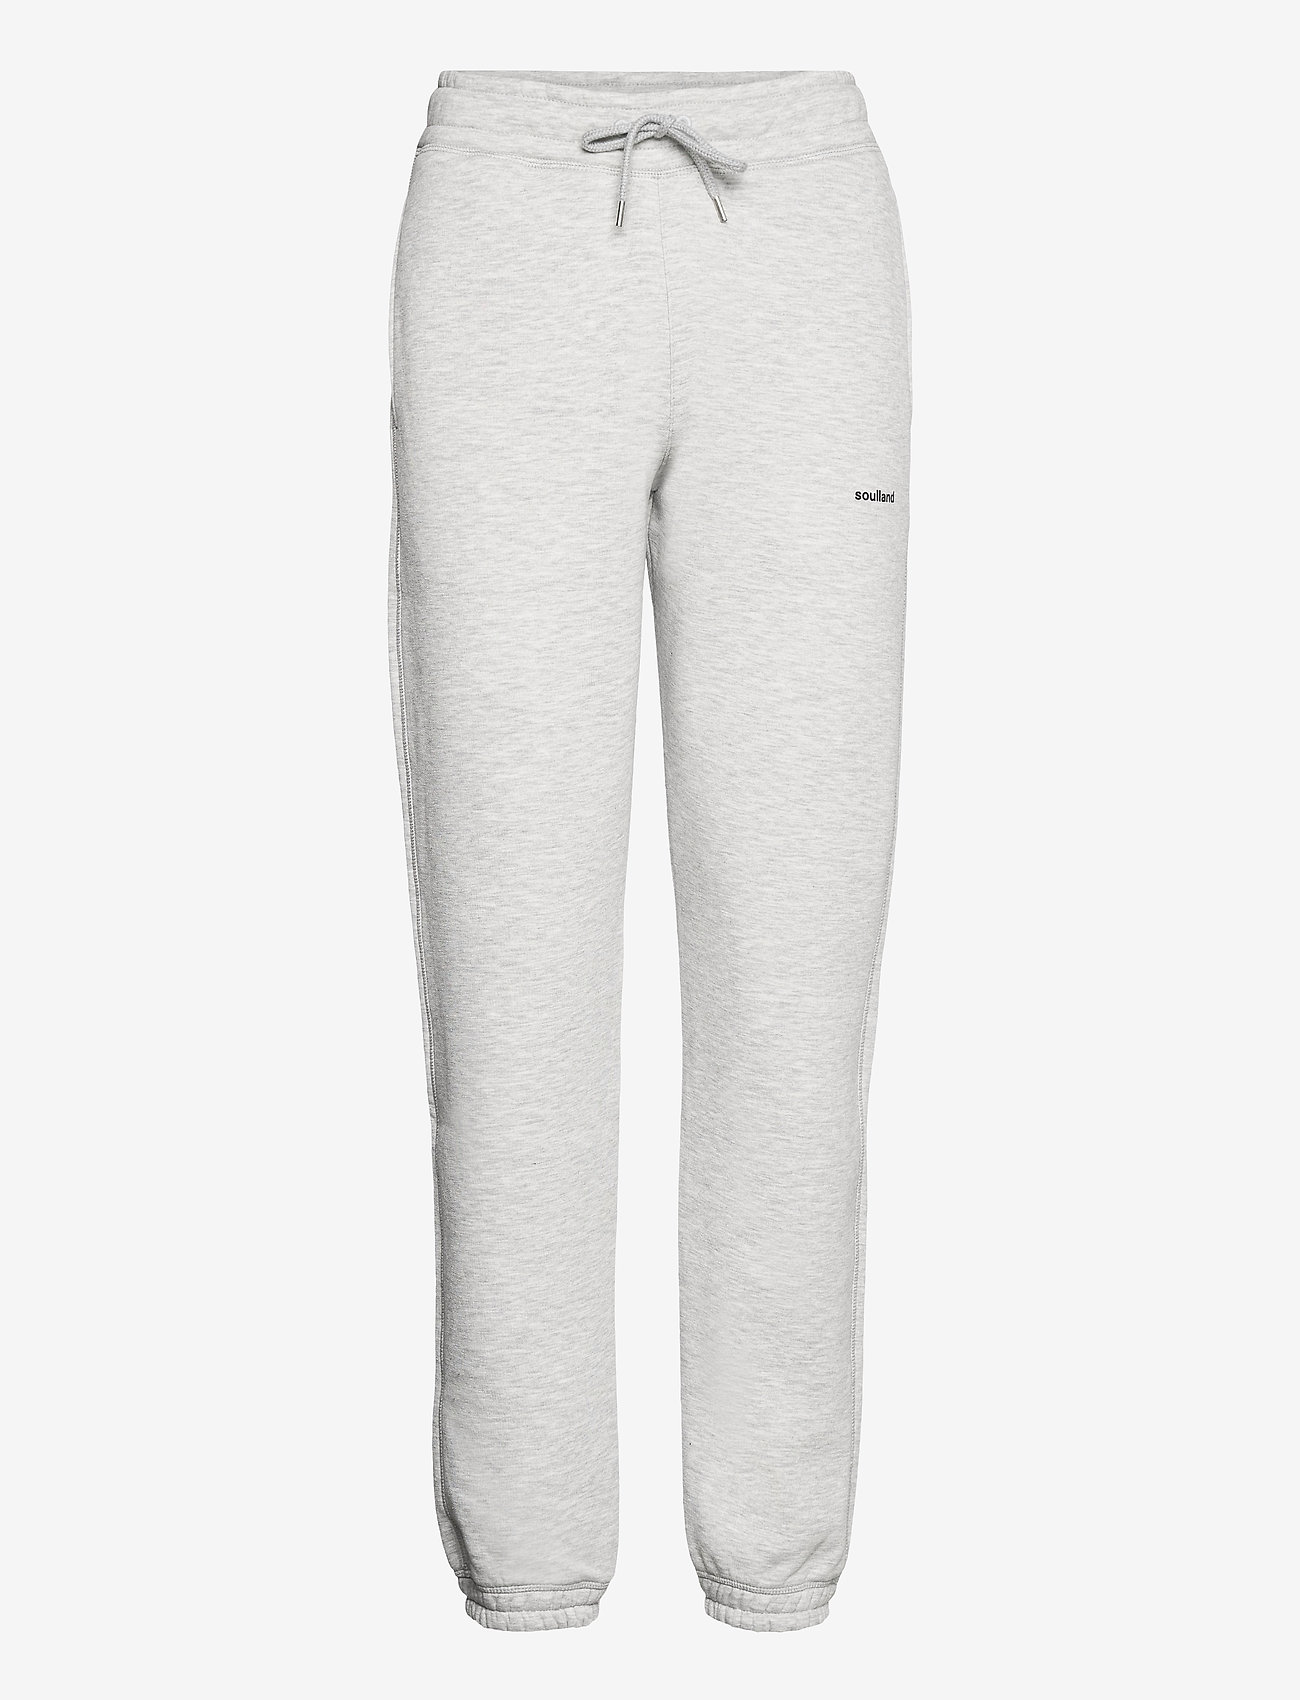 Soulland - Eisa pants - kleidung - grey melange - 0